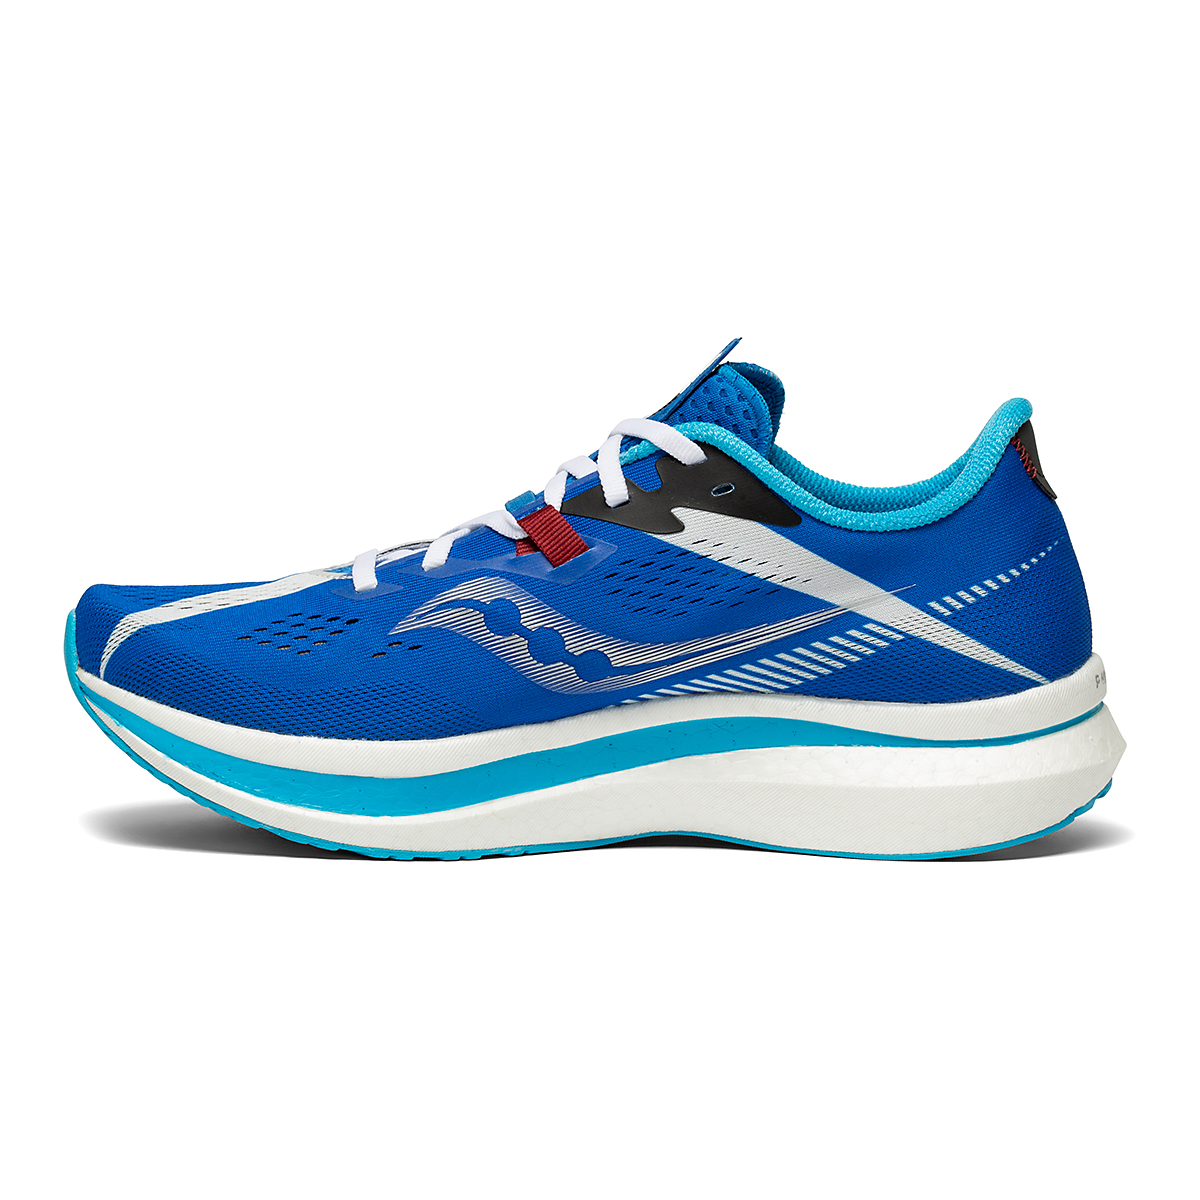 Men's Saucony Endorphin Pro 2 Running Shoe - Color: Royal/White - Size: 7 - Width: Regular, Royal/White, large, image 2